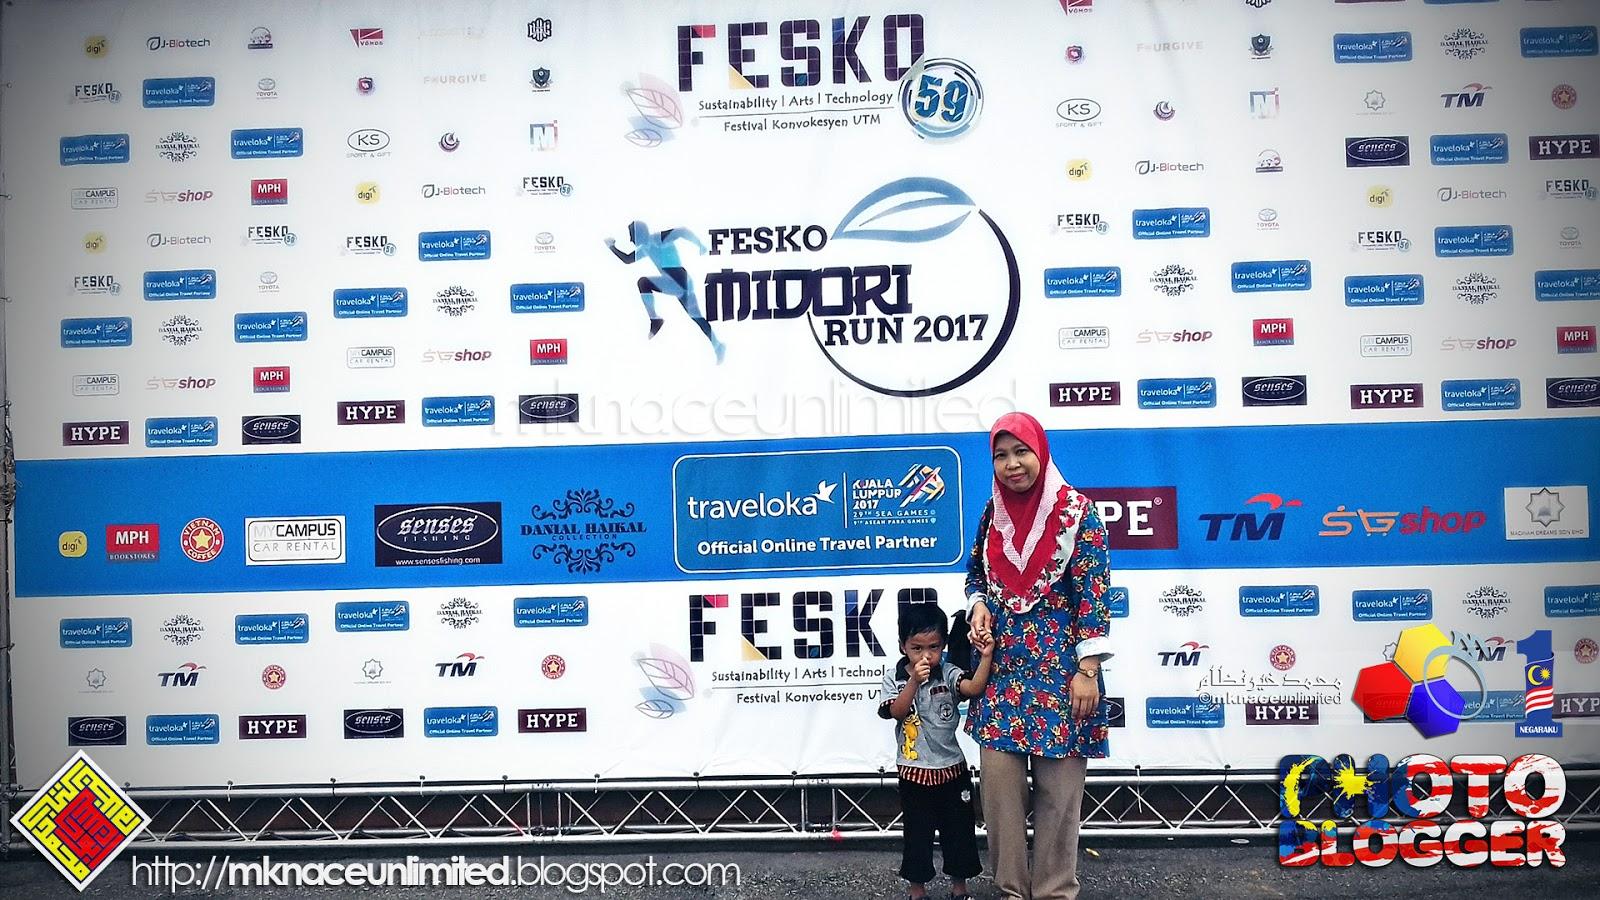 Fesko 59 Utm Skudai 20171027 Layan Tapak Mknace Unlimited The Jam Tangan Fashion Couple Pinewood  Sepasang Sempat Posing Dulu Ye